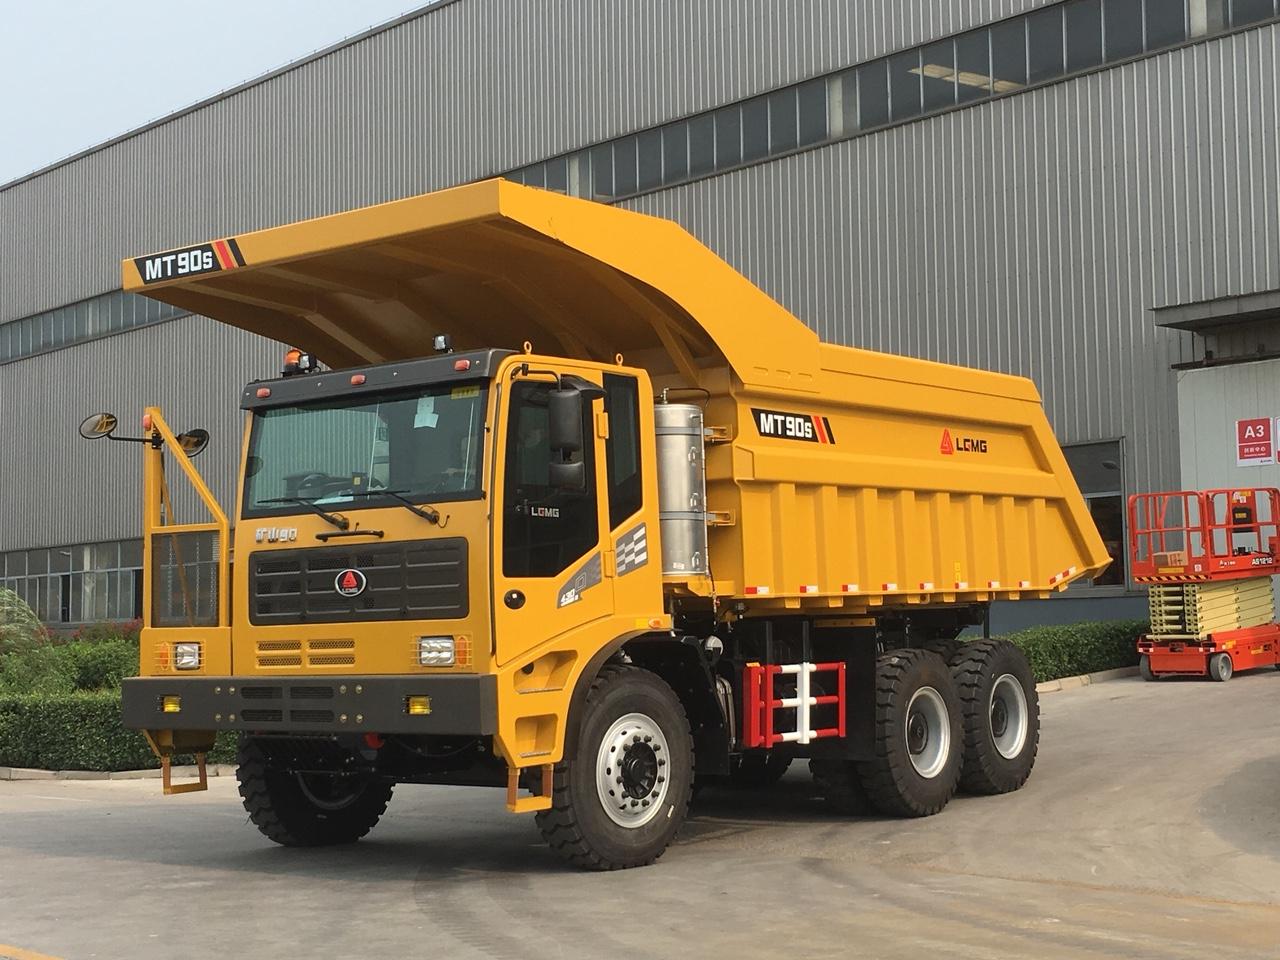 xe bá vương mỏ 90 tấn MT90S Bảo Khang